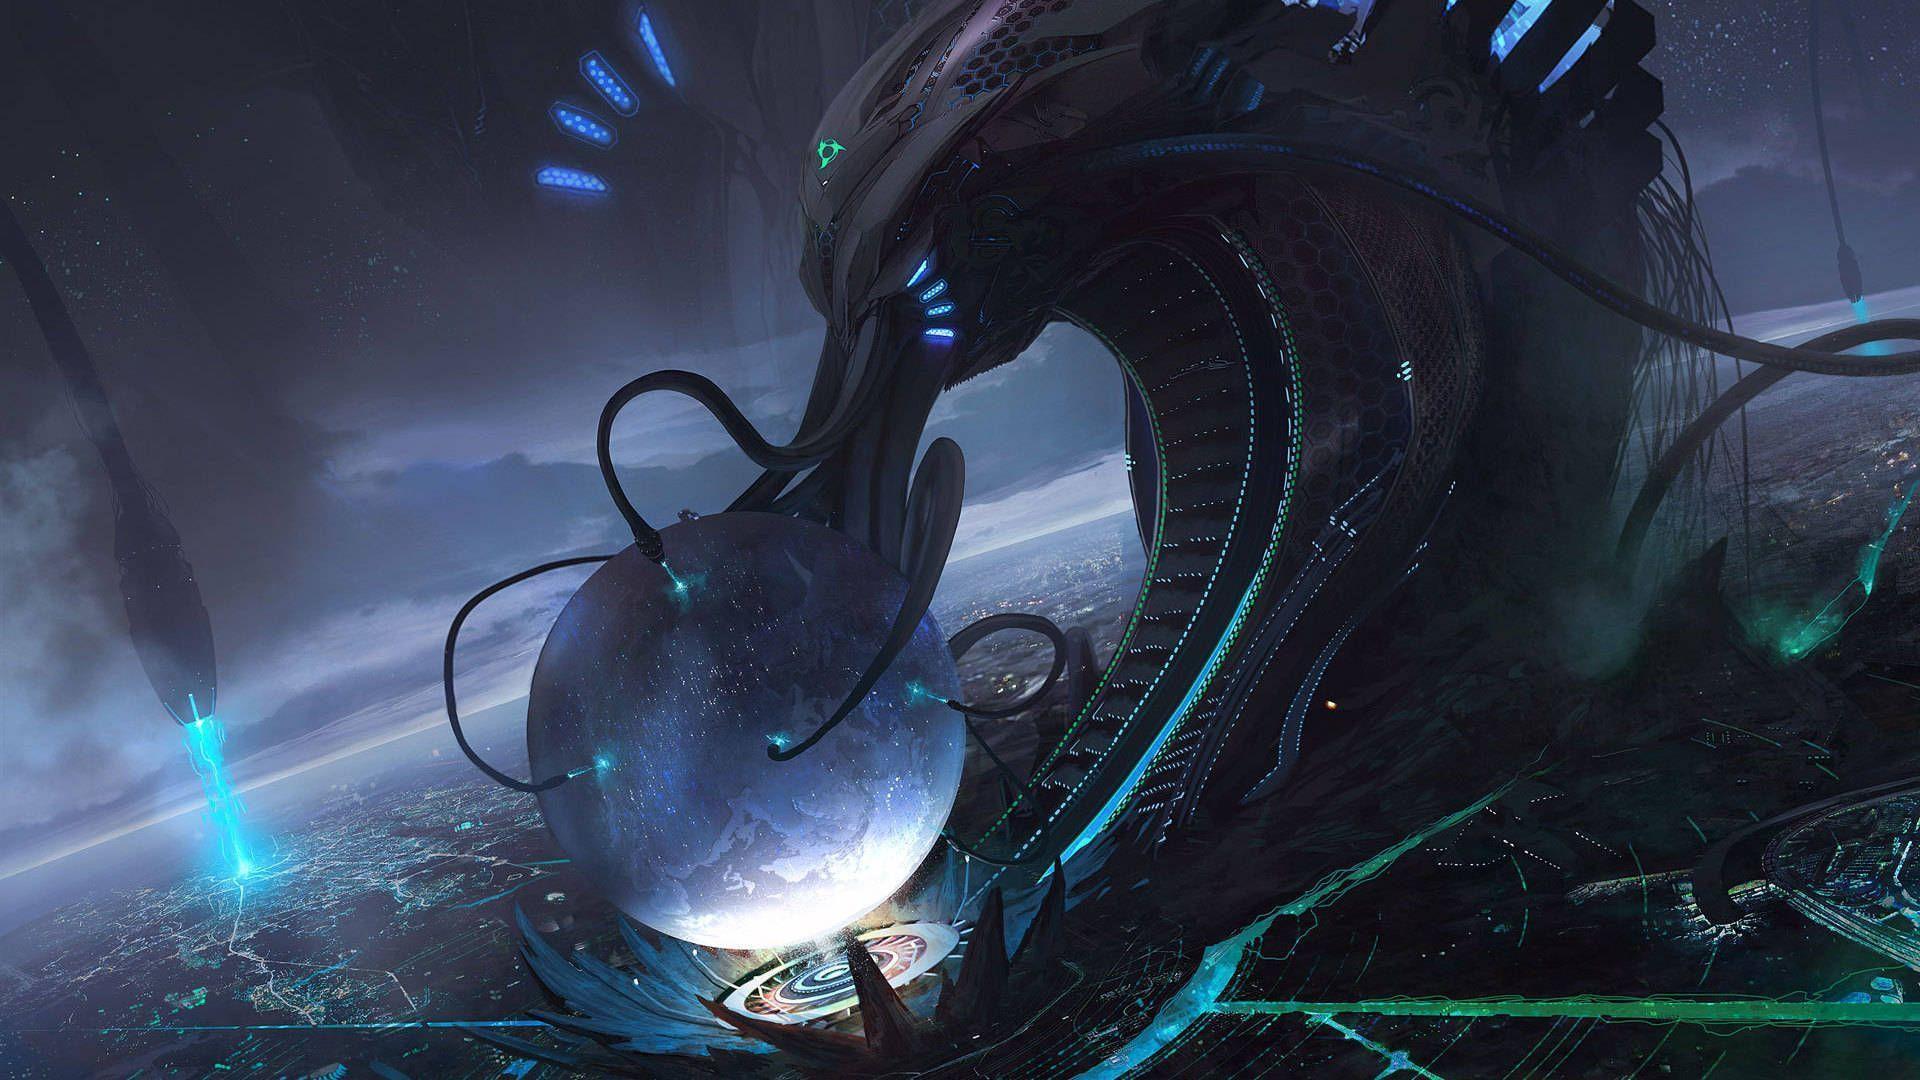 Science Fiction Wallpapers Sci Fi Wallpapers 2 Desktop: Sci Fi Desktop Backgrounds